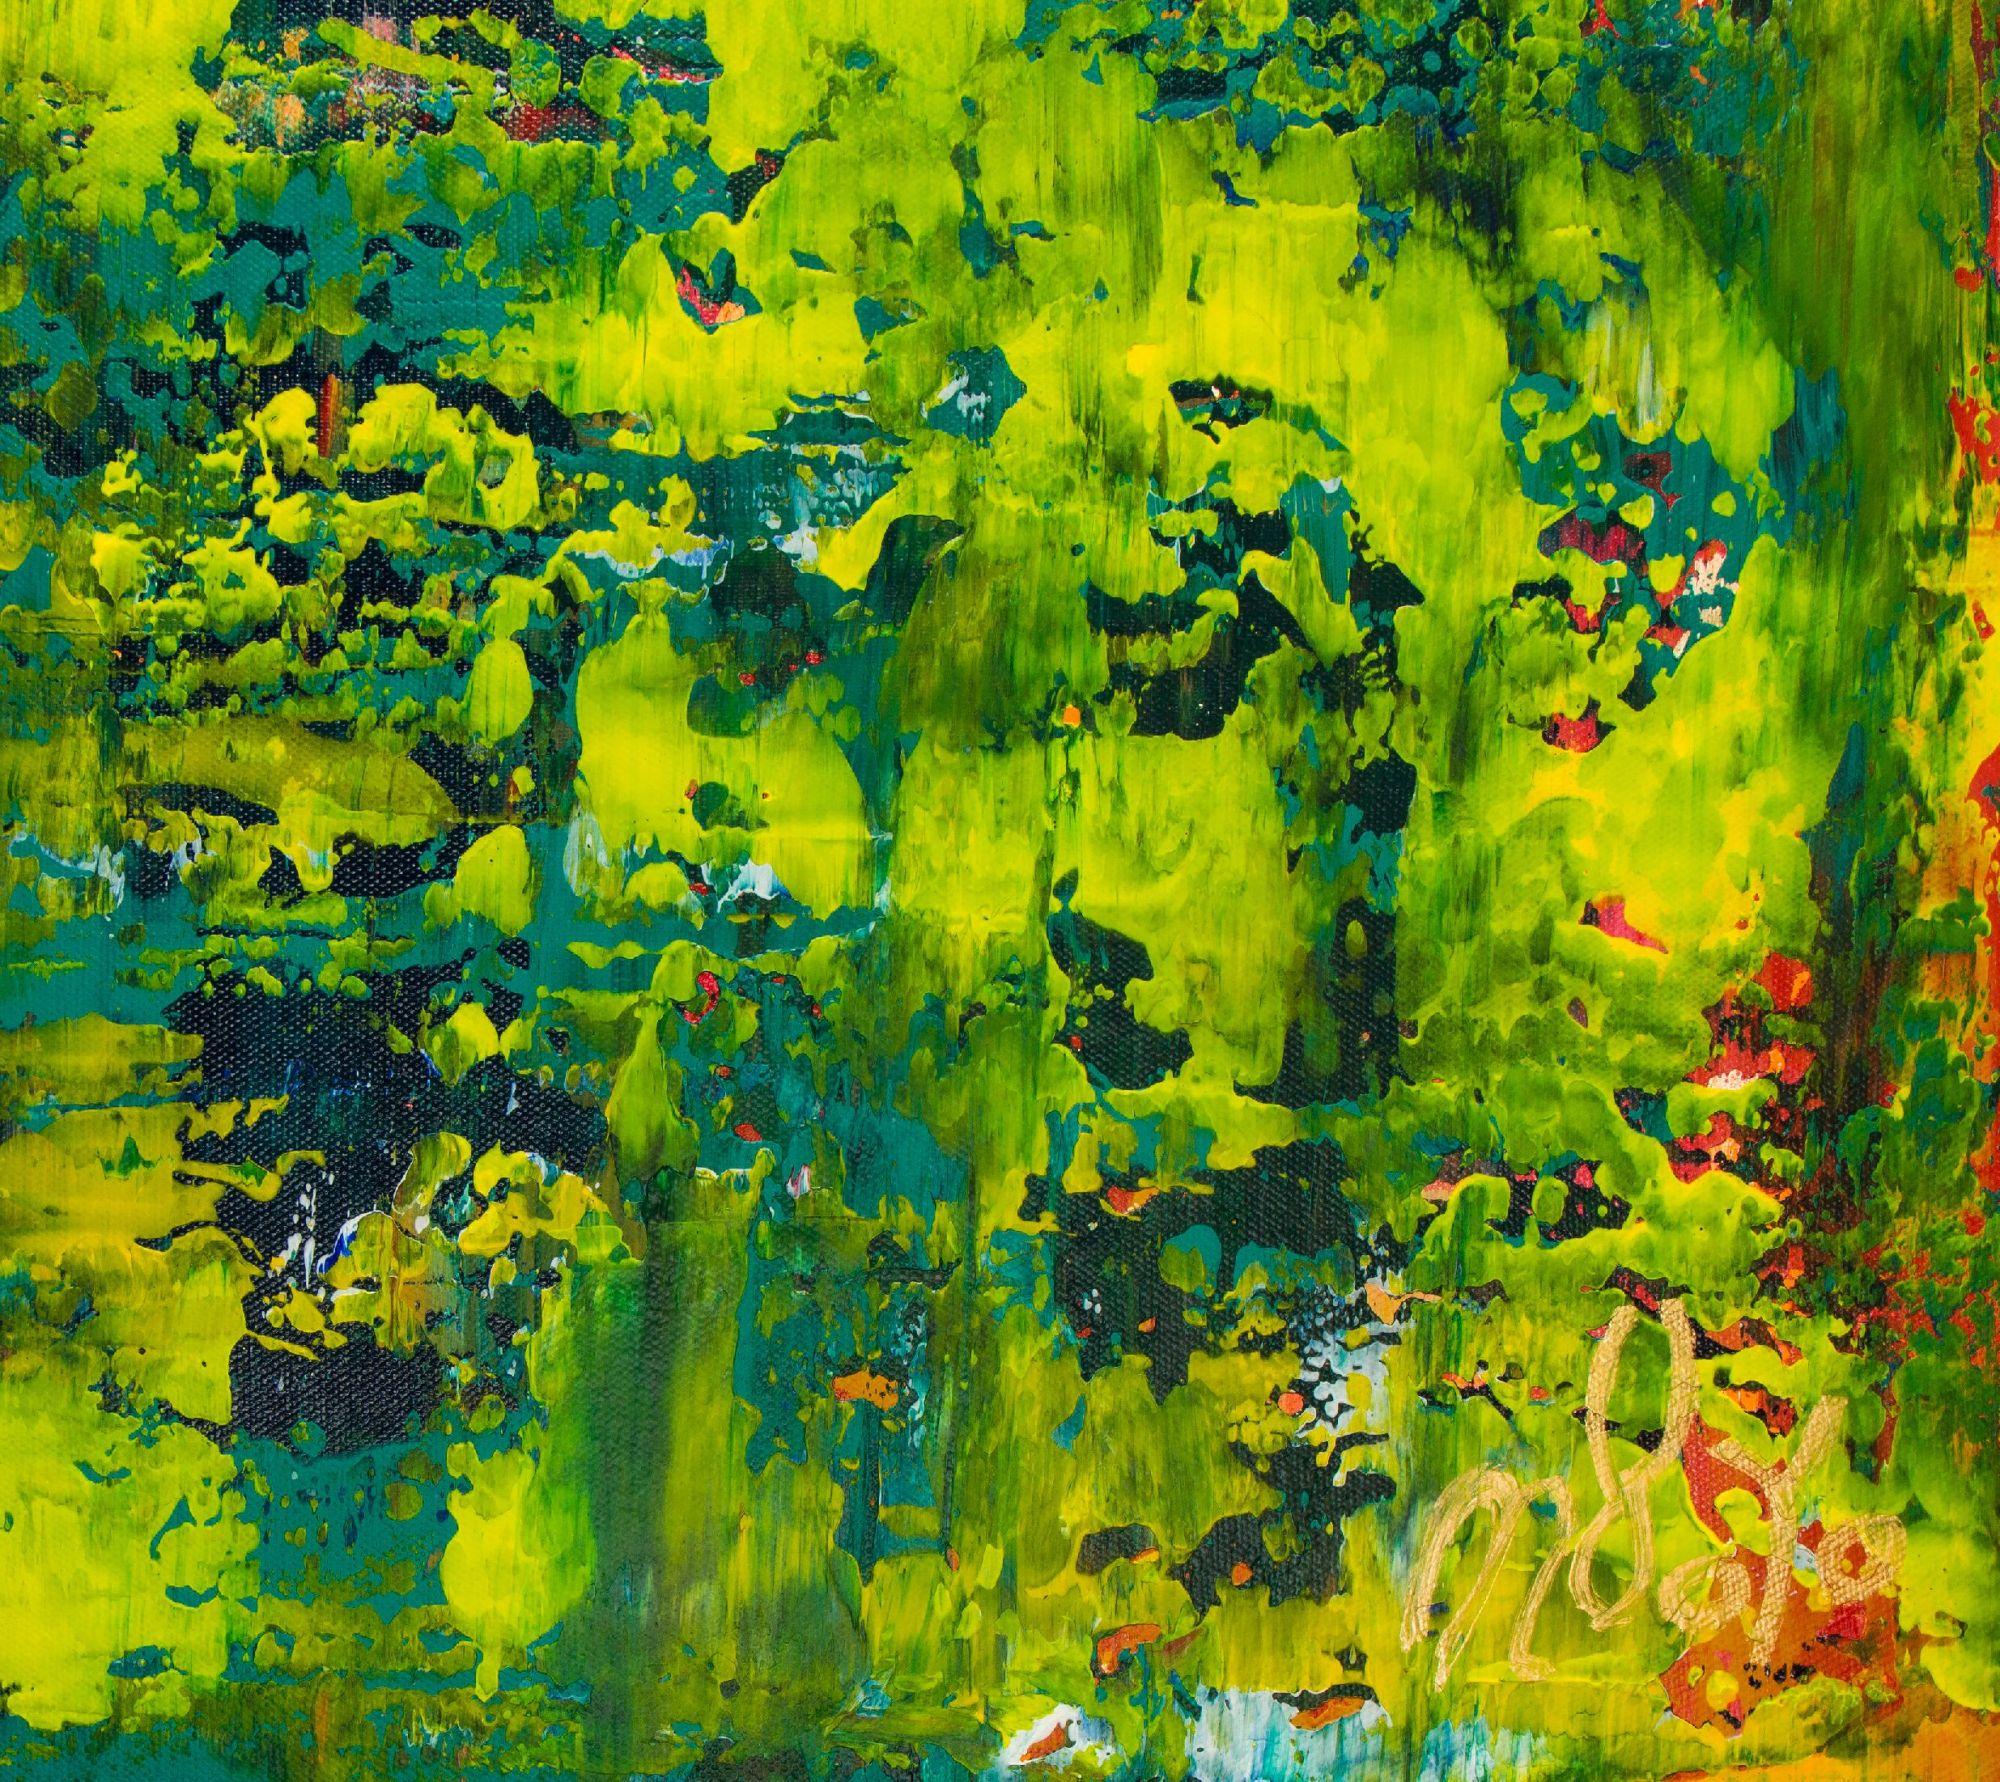 Signature - Spring glimmer (2021) by Nestor Toro